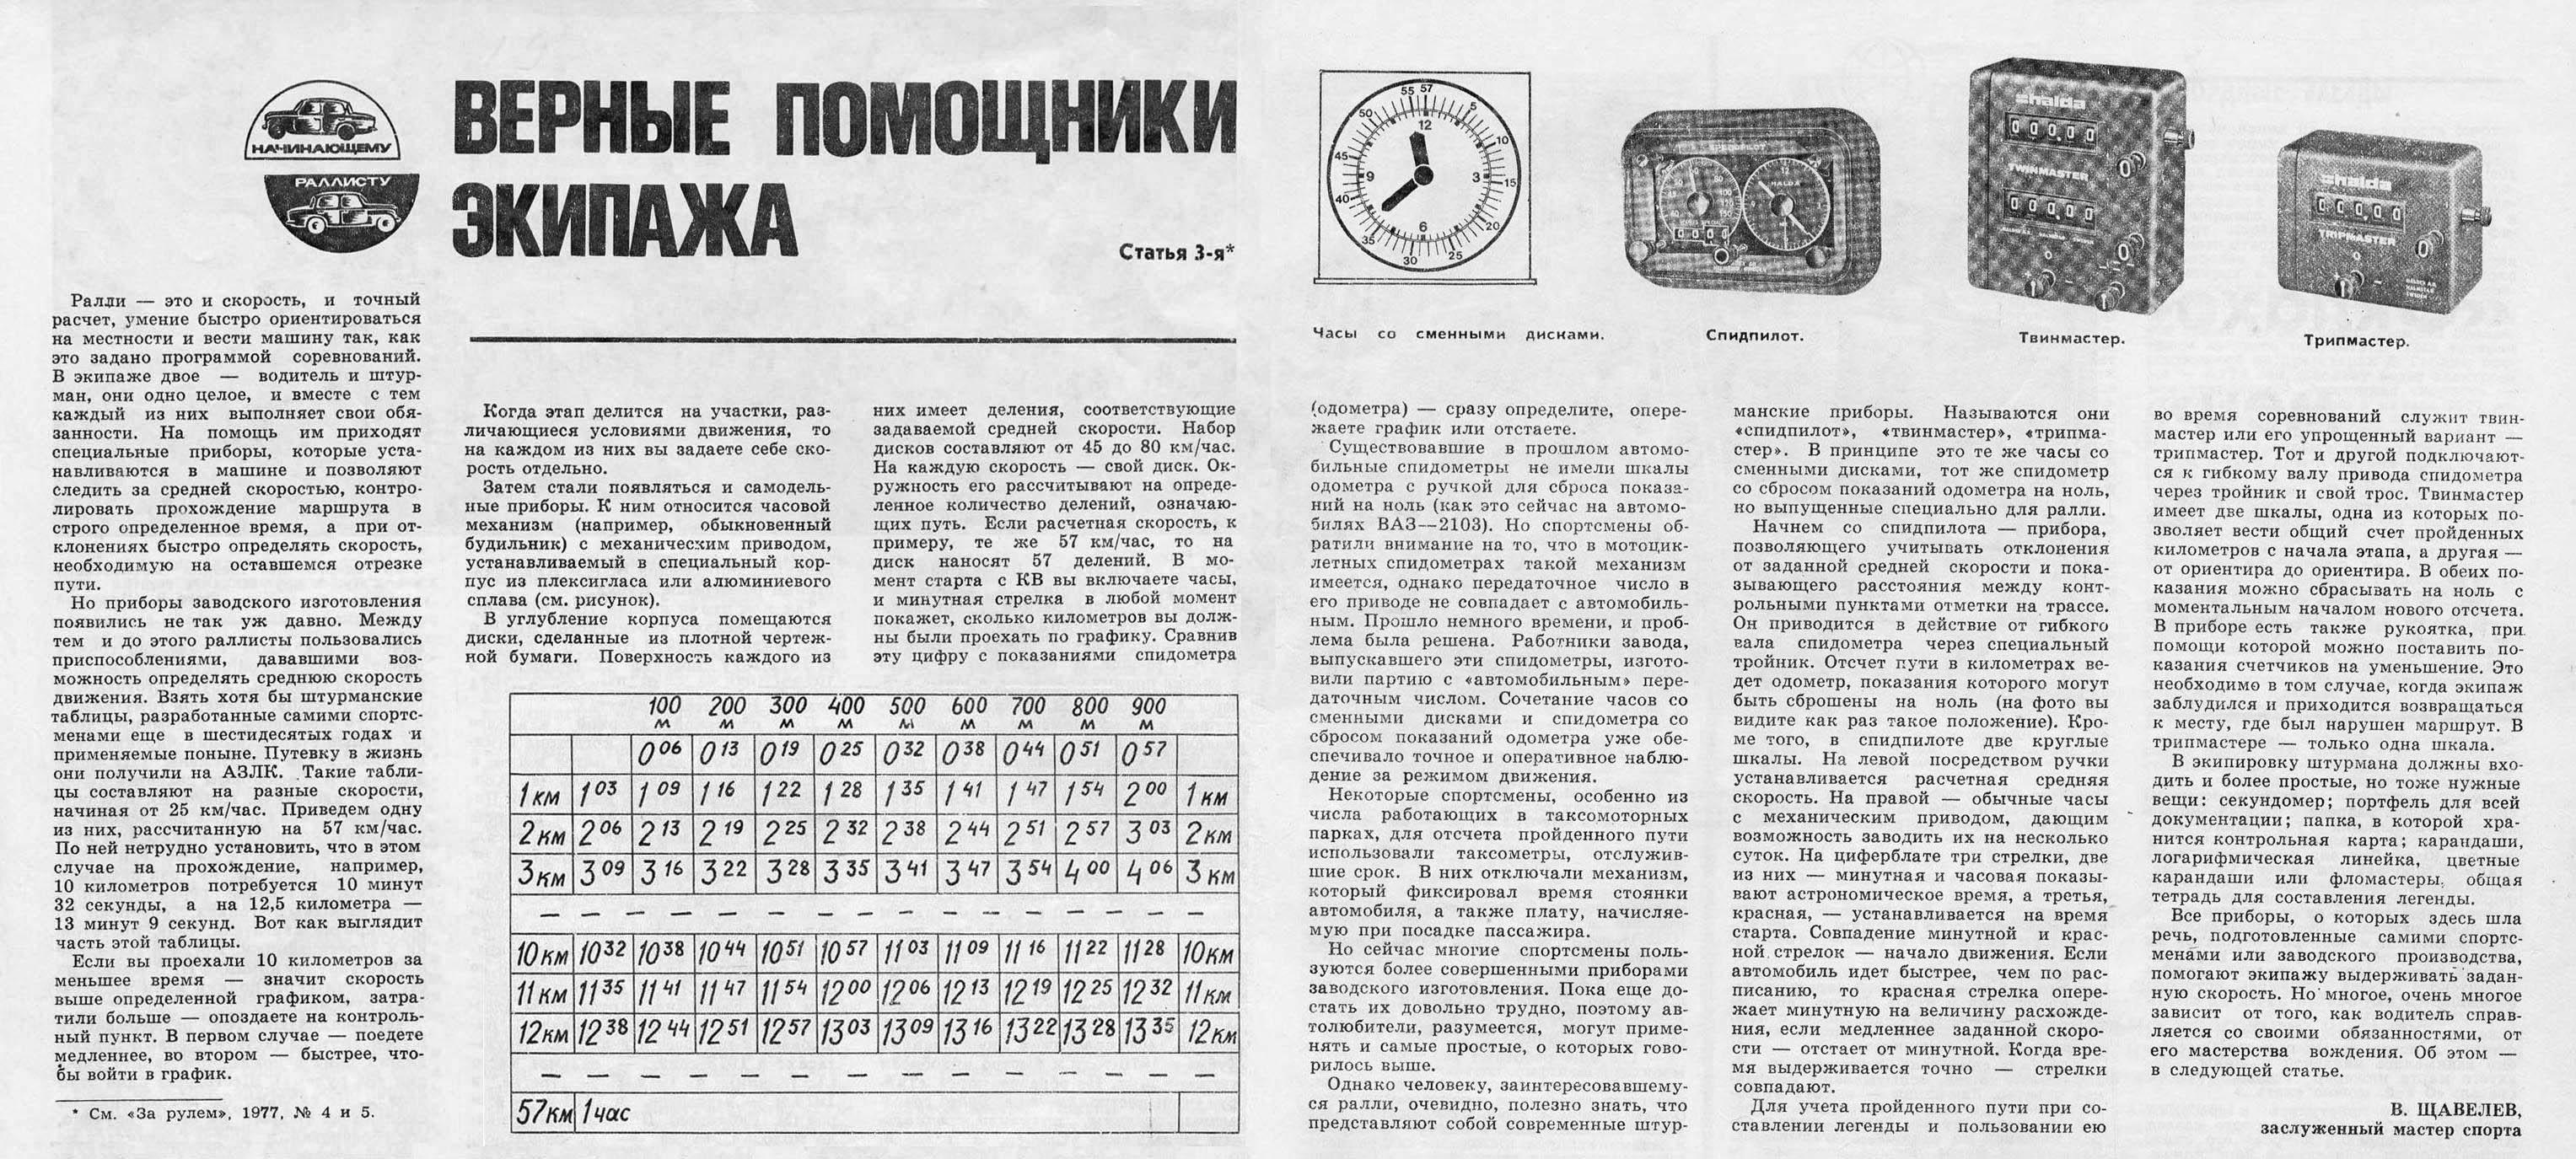 http://www.sovietrally.ru/lim/lim-shd-05.JPG